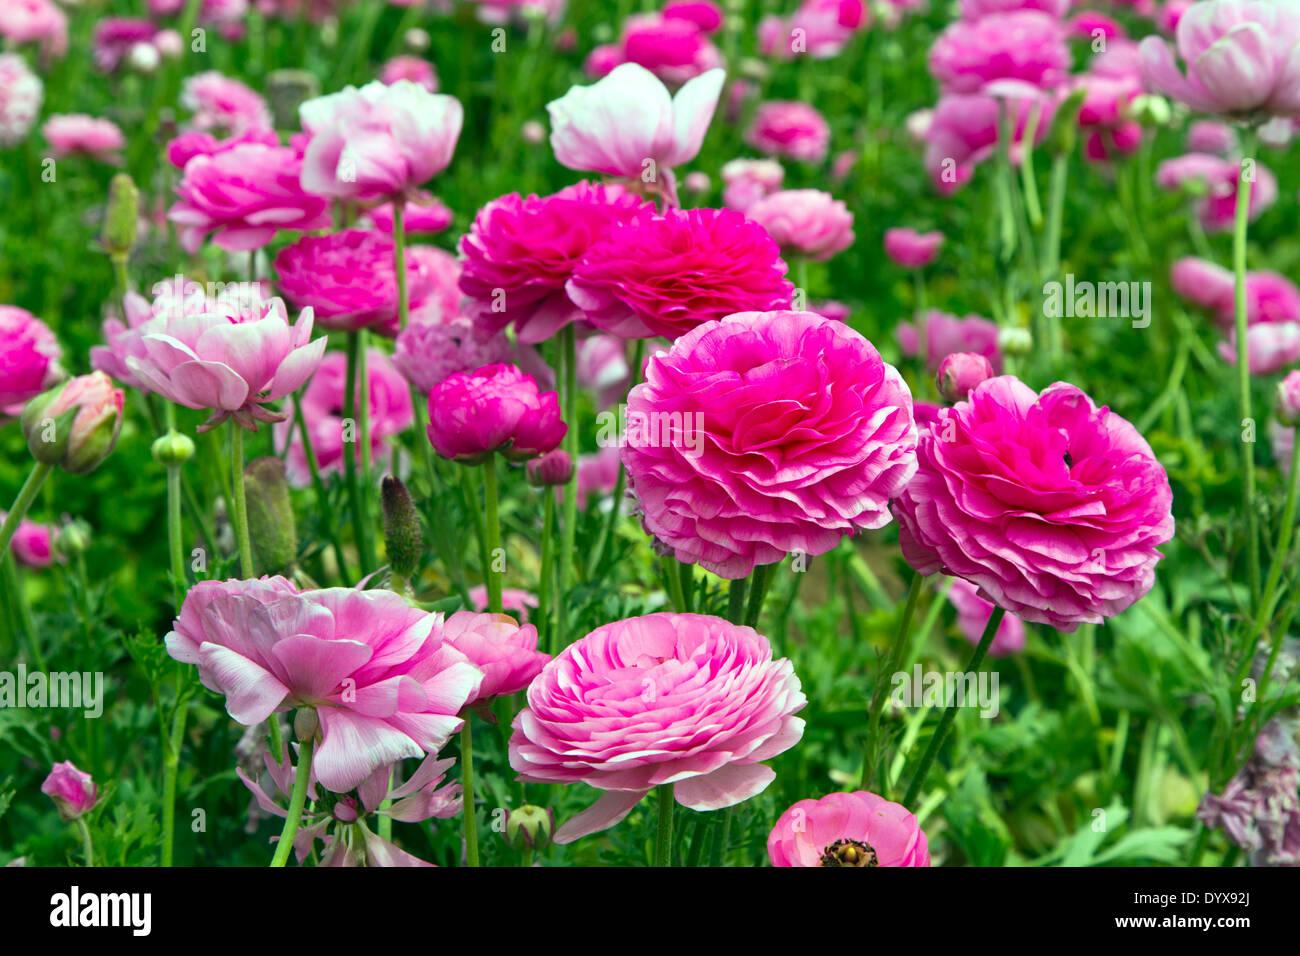 Flower Fields Carlsbad California Usa Stock Photos & Flower Fields ...